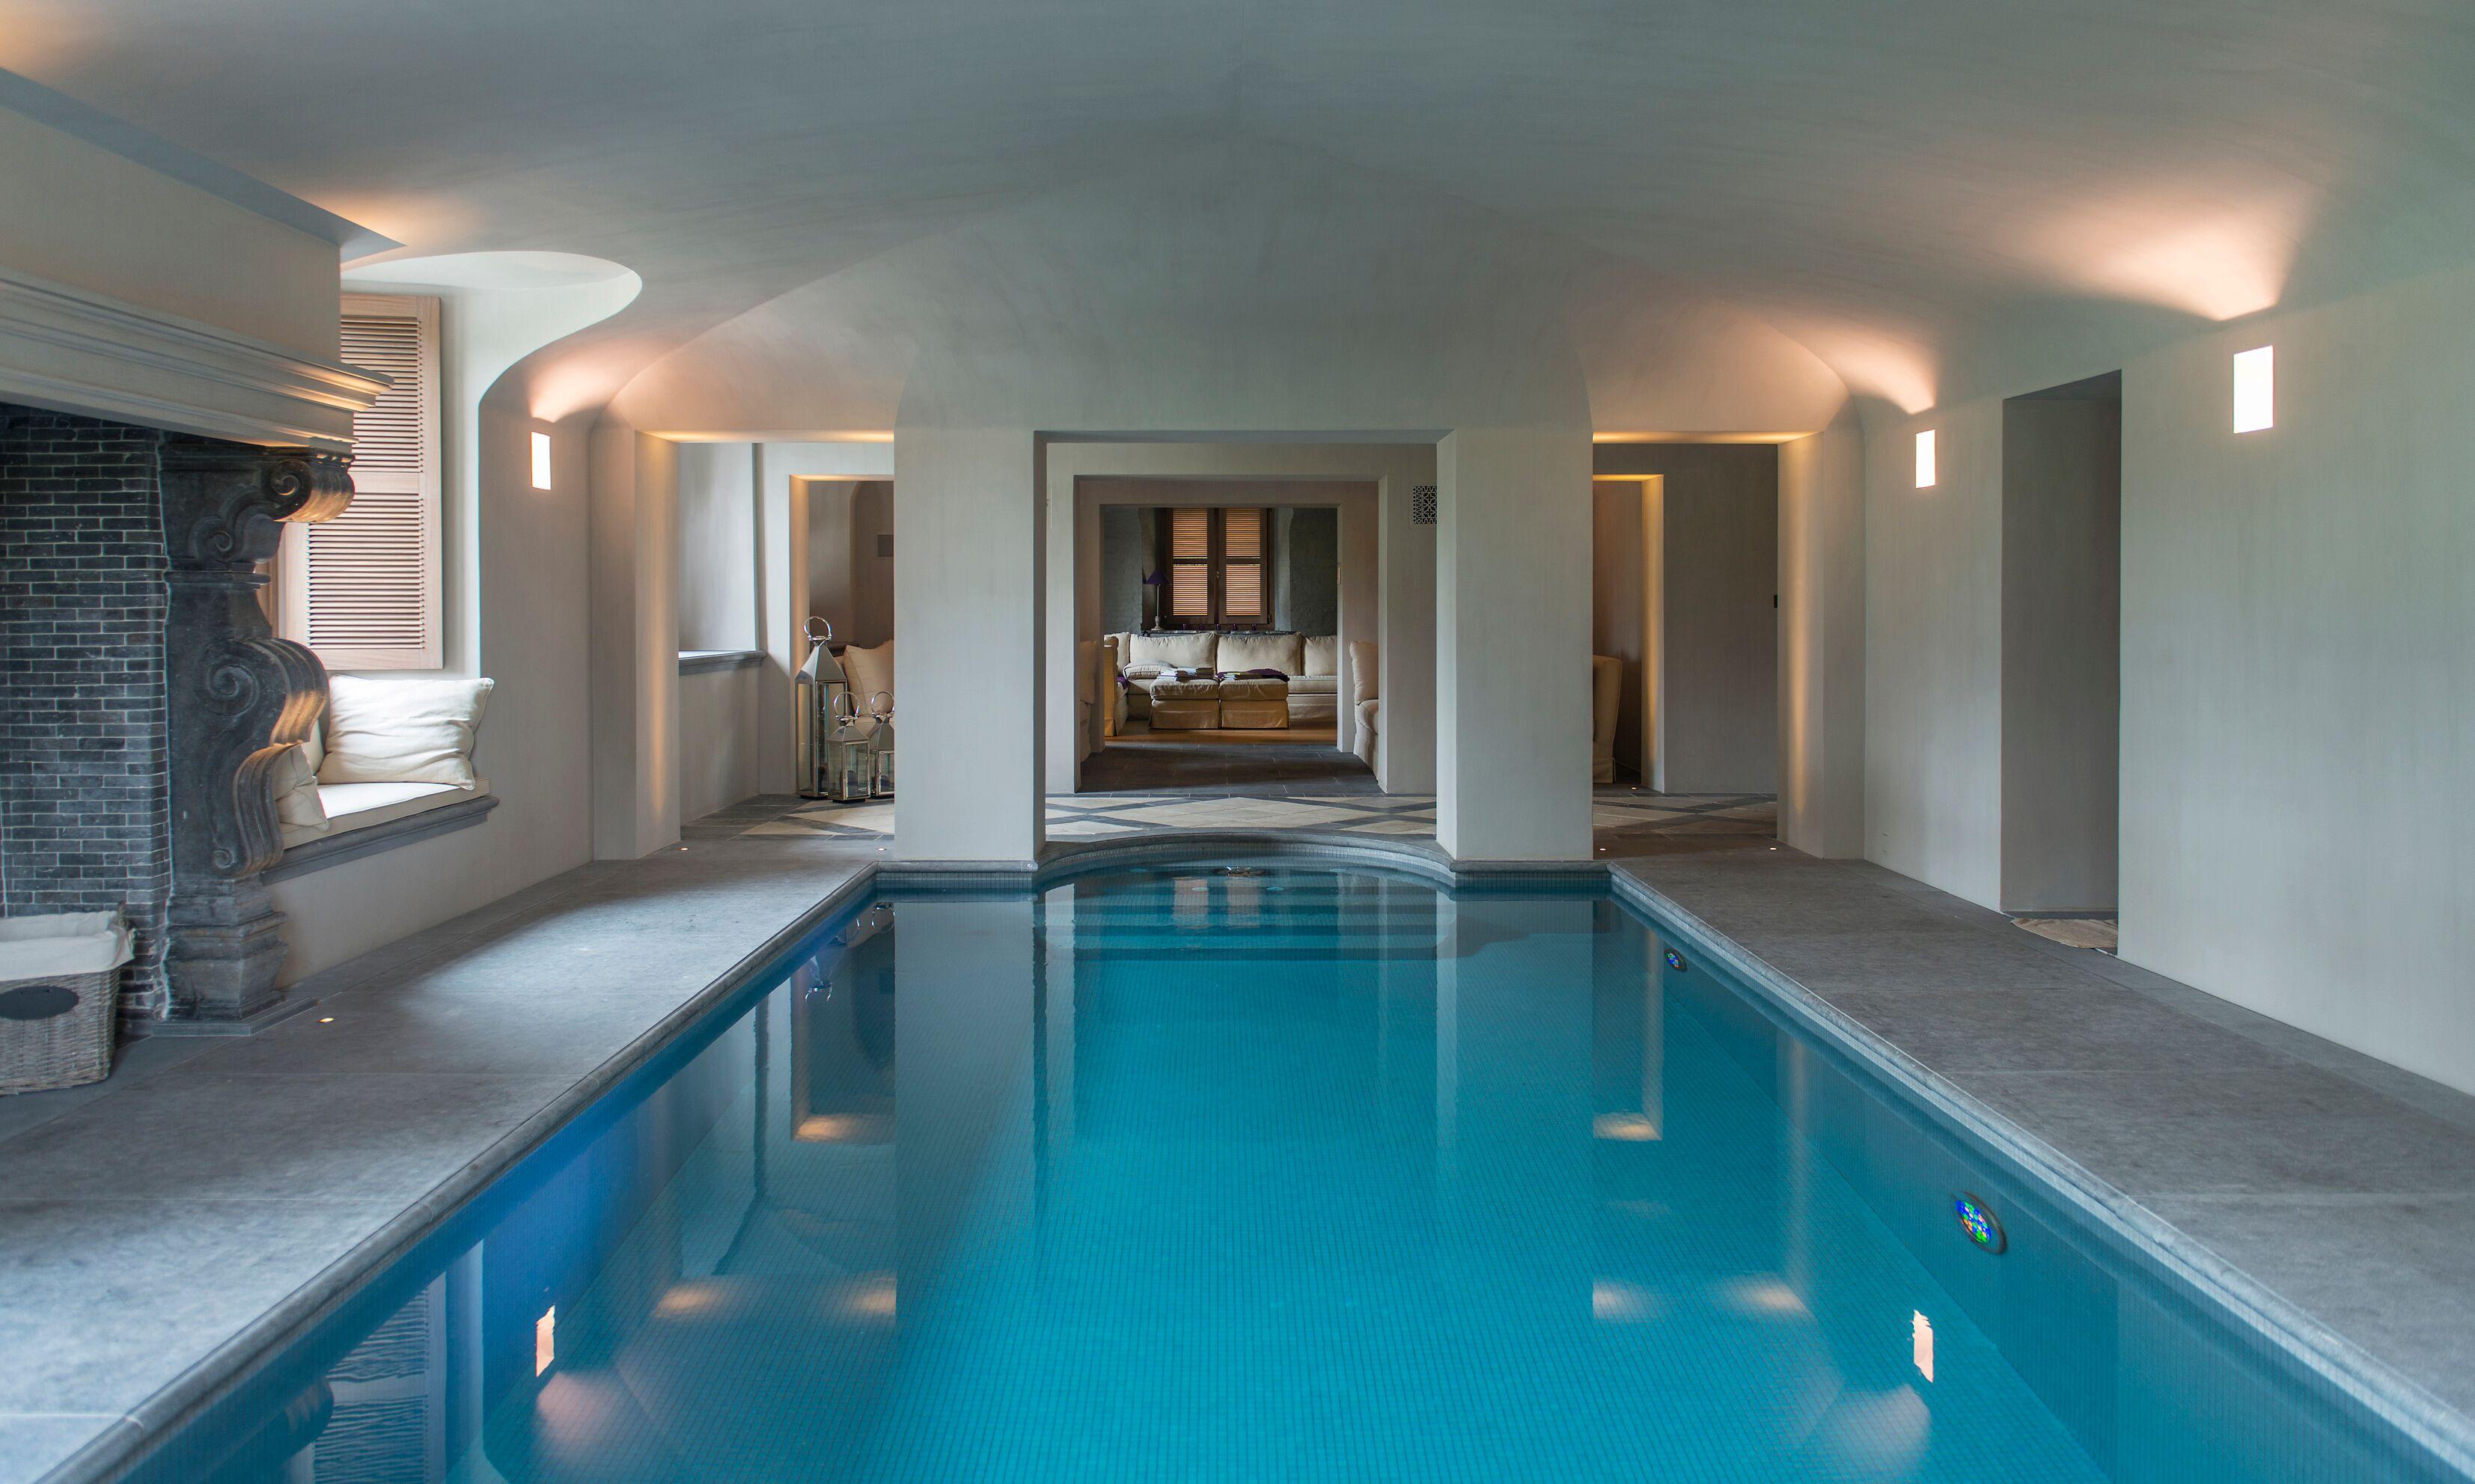 La piscina interna con zona relax